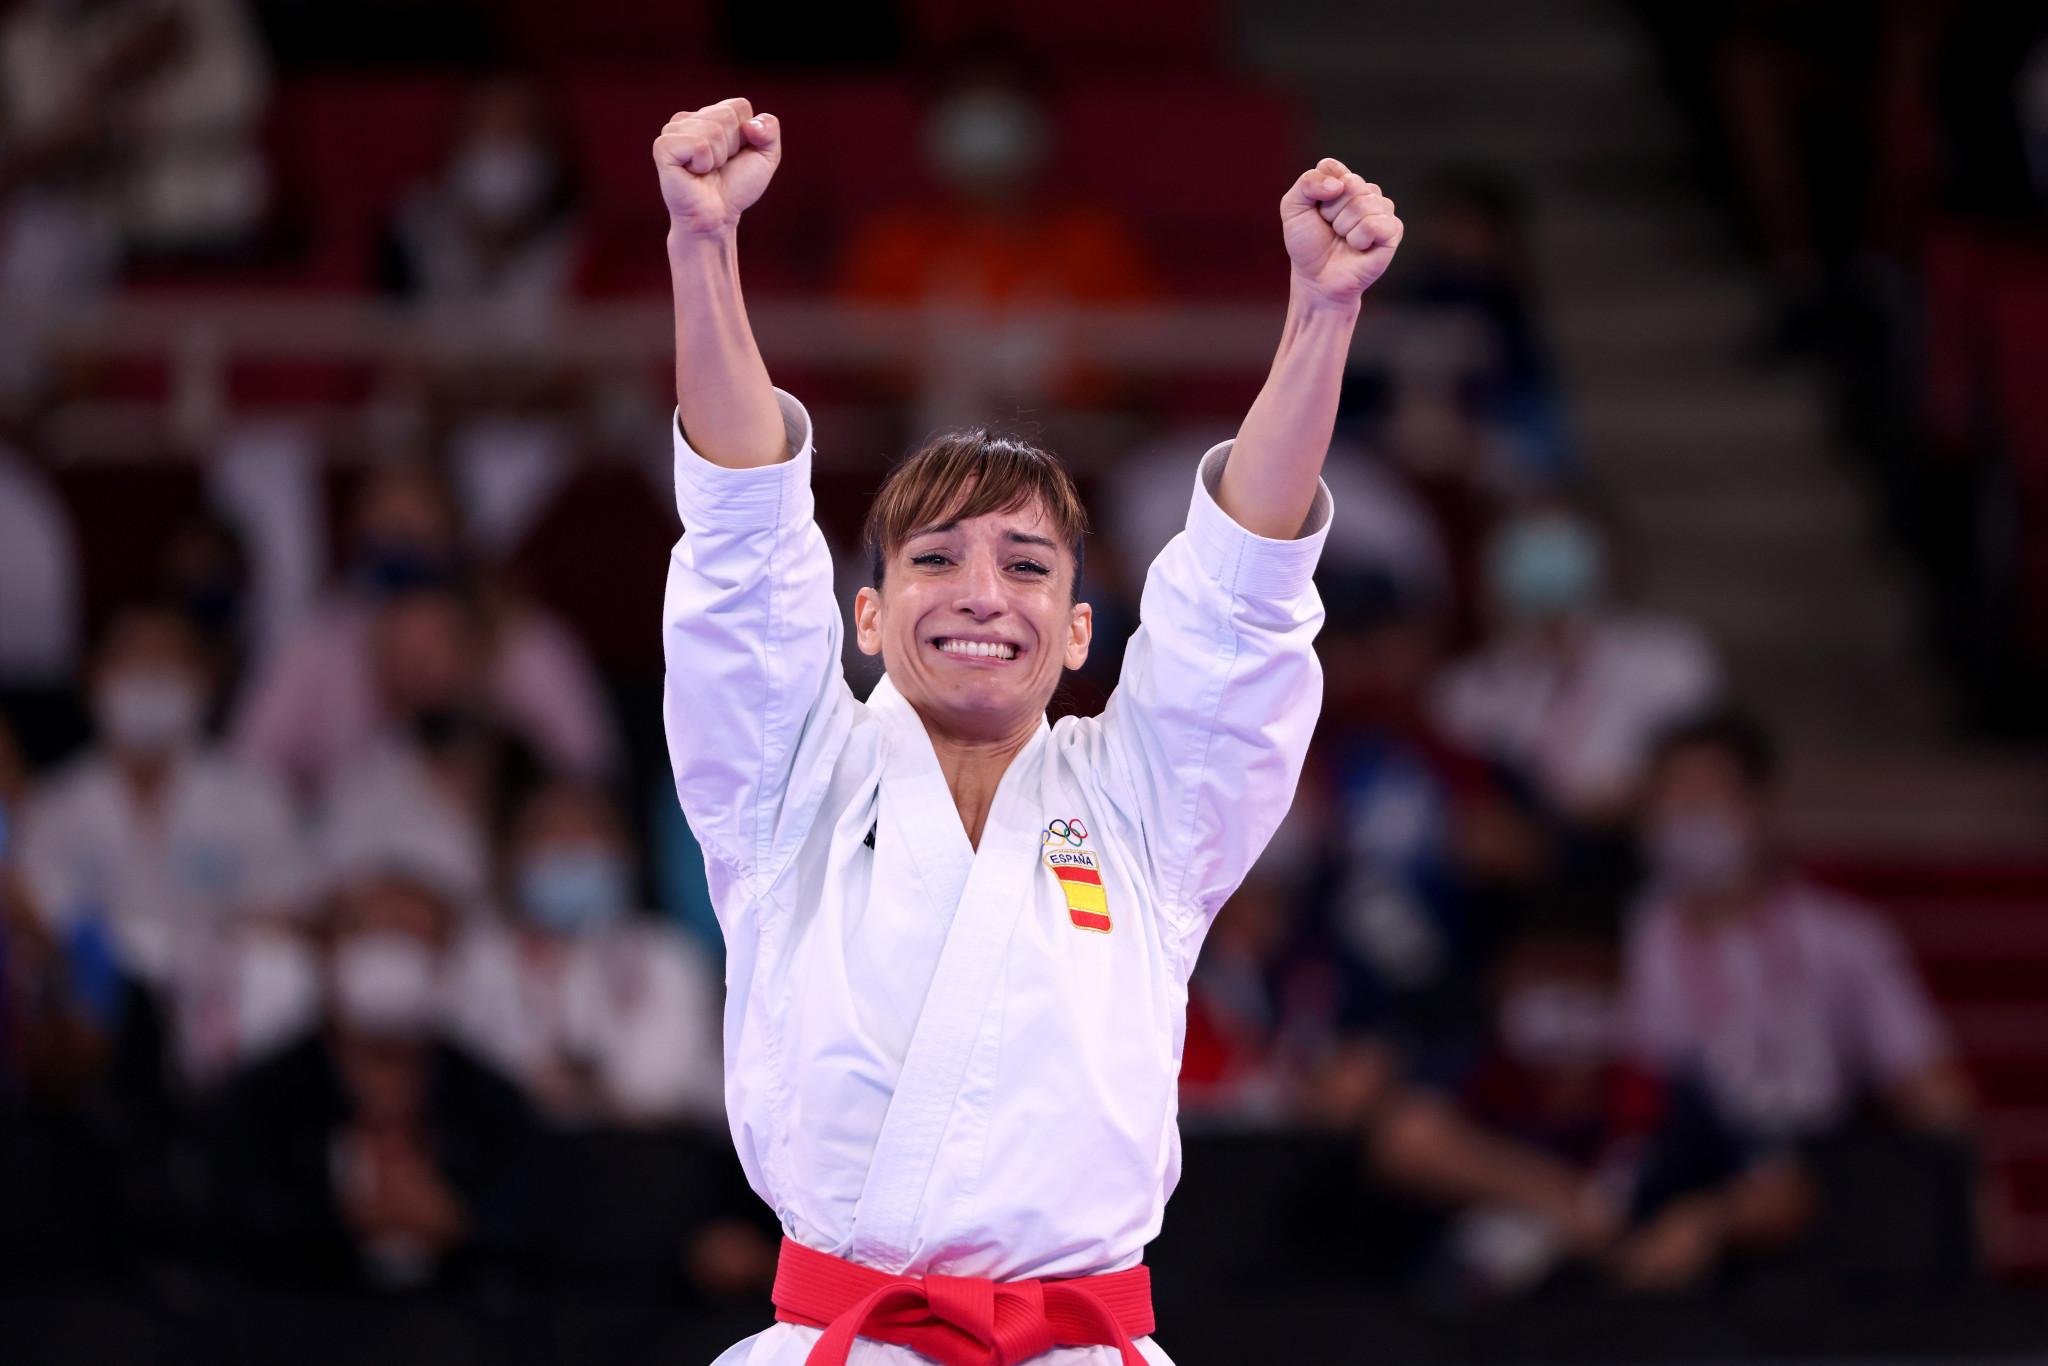 Karate 1-Premier League Grand Winners from past two seasons revealed